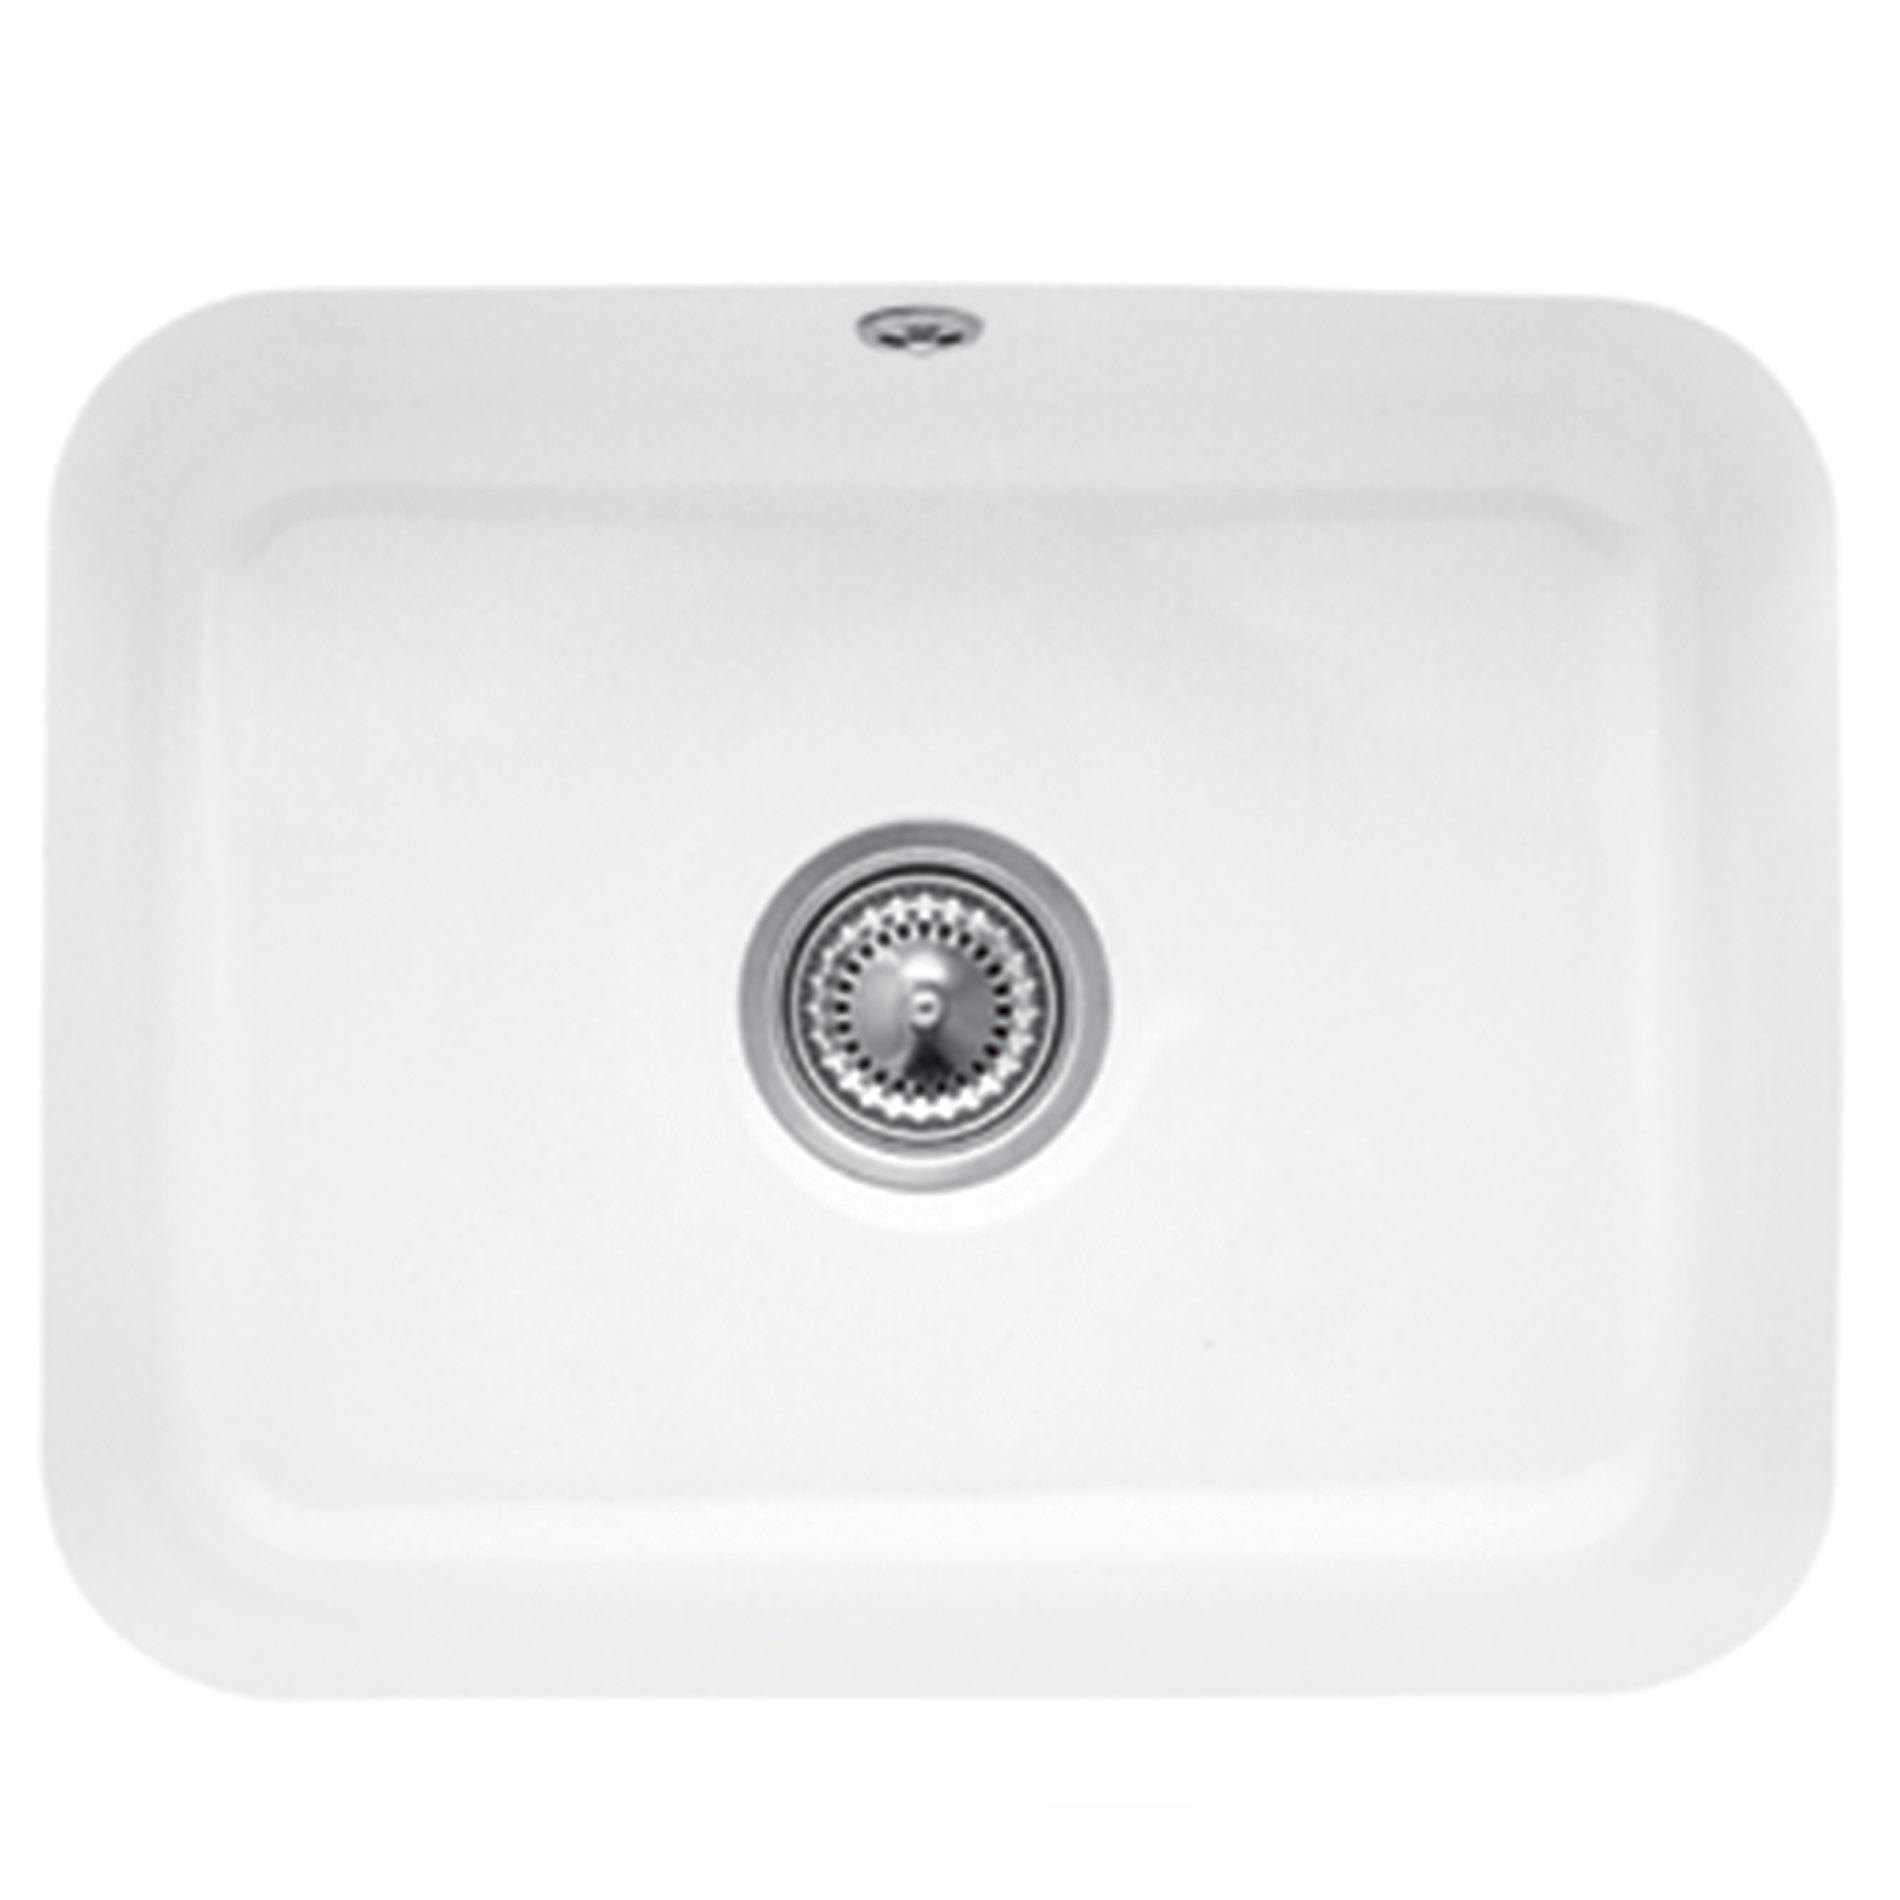 Villeroy boch cisterna 60c ceramic sink kitchen sinks - Villeroy y boch ...